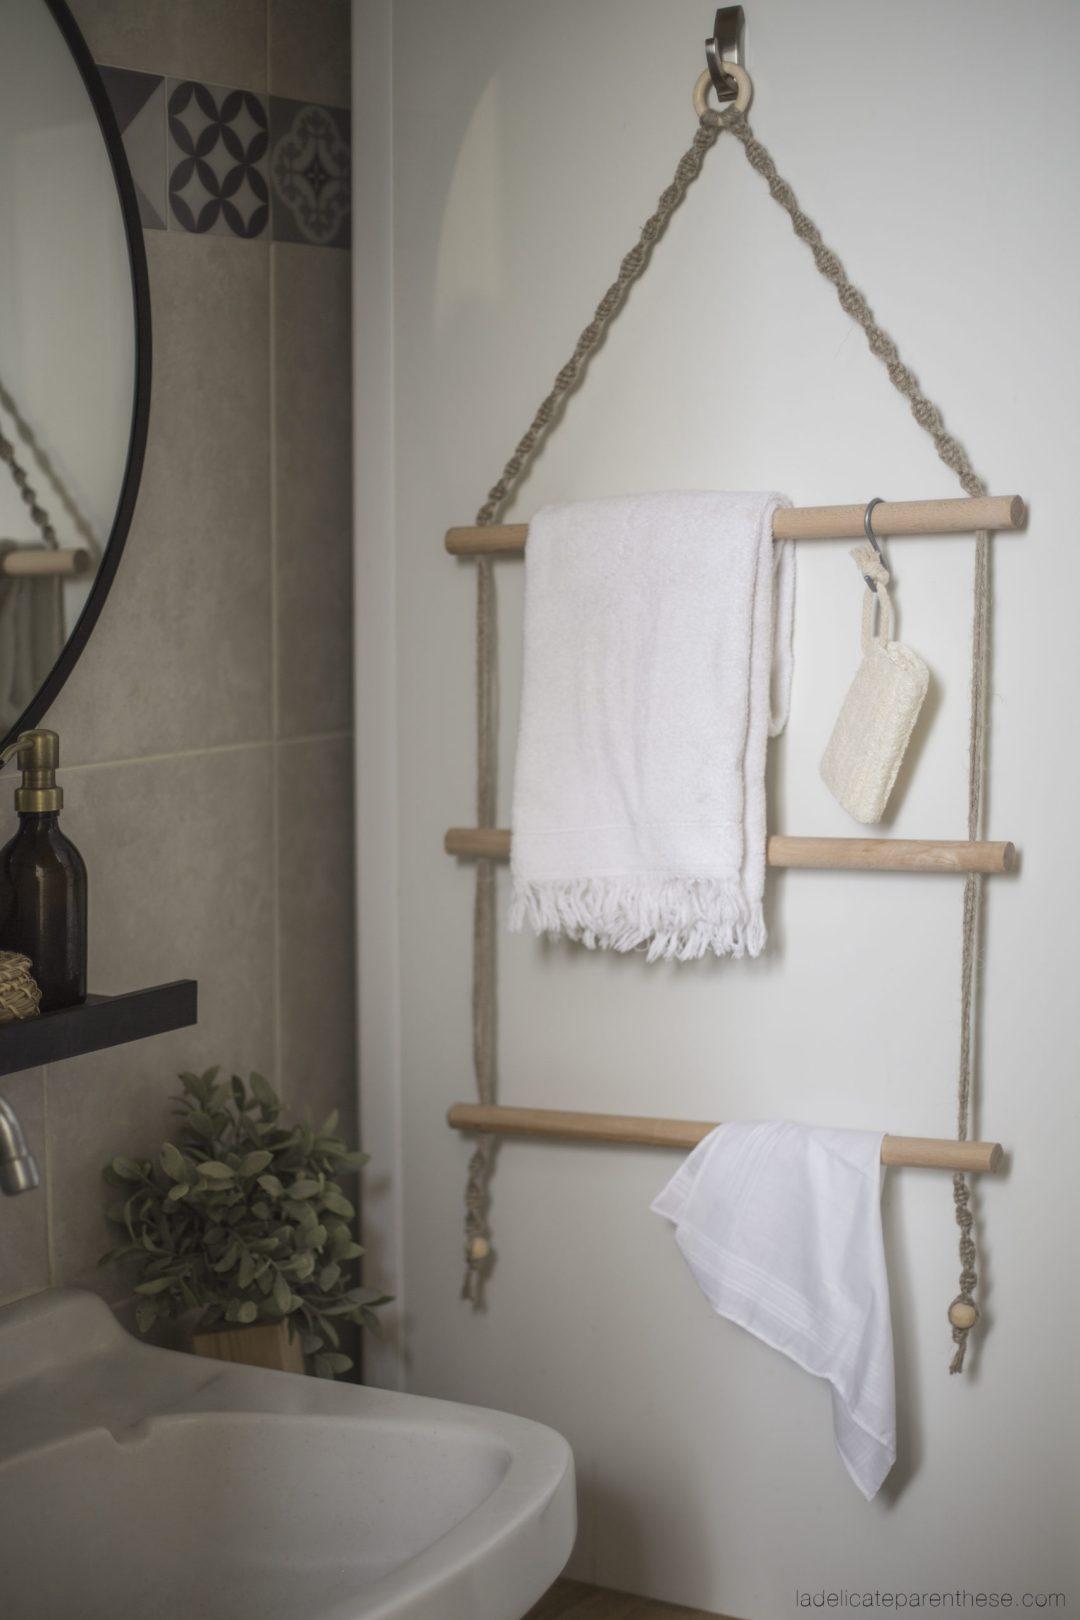 creation handmade wall hanging towel decoration